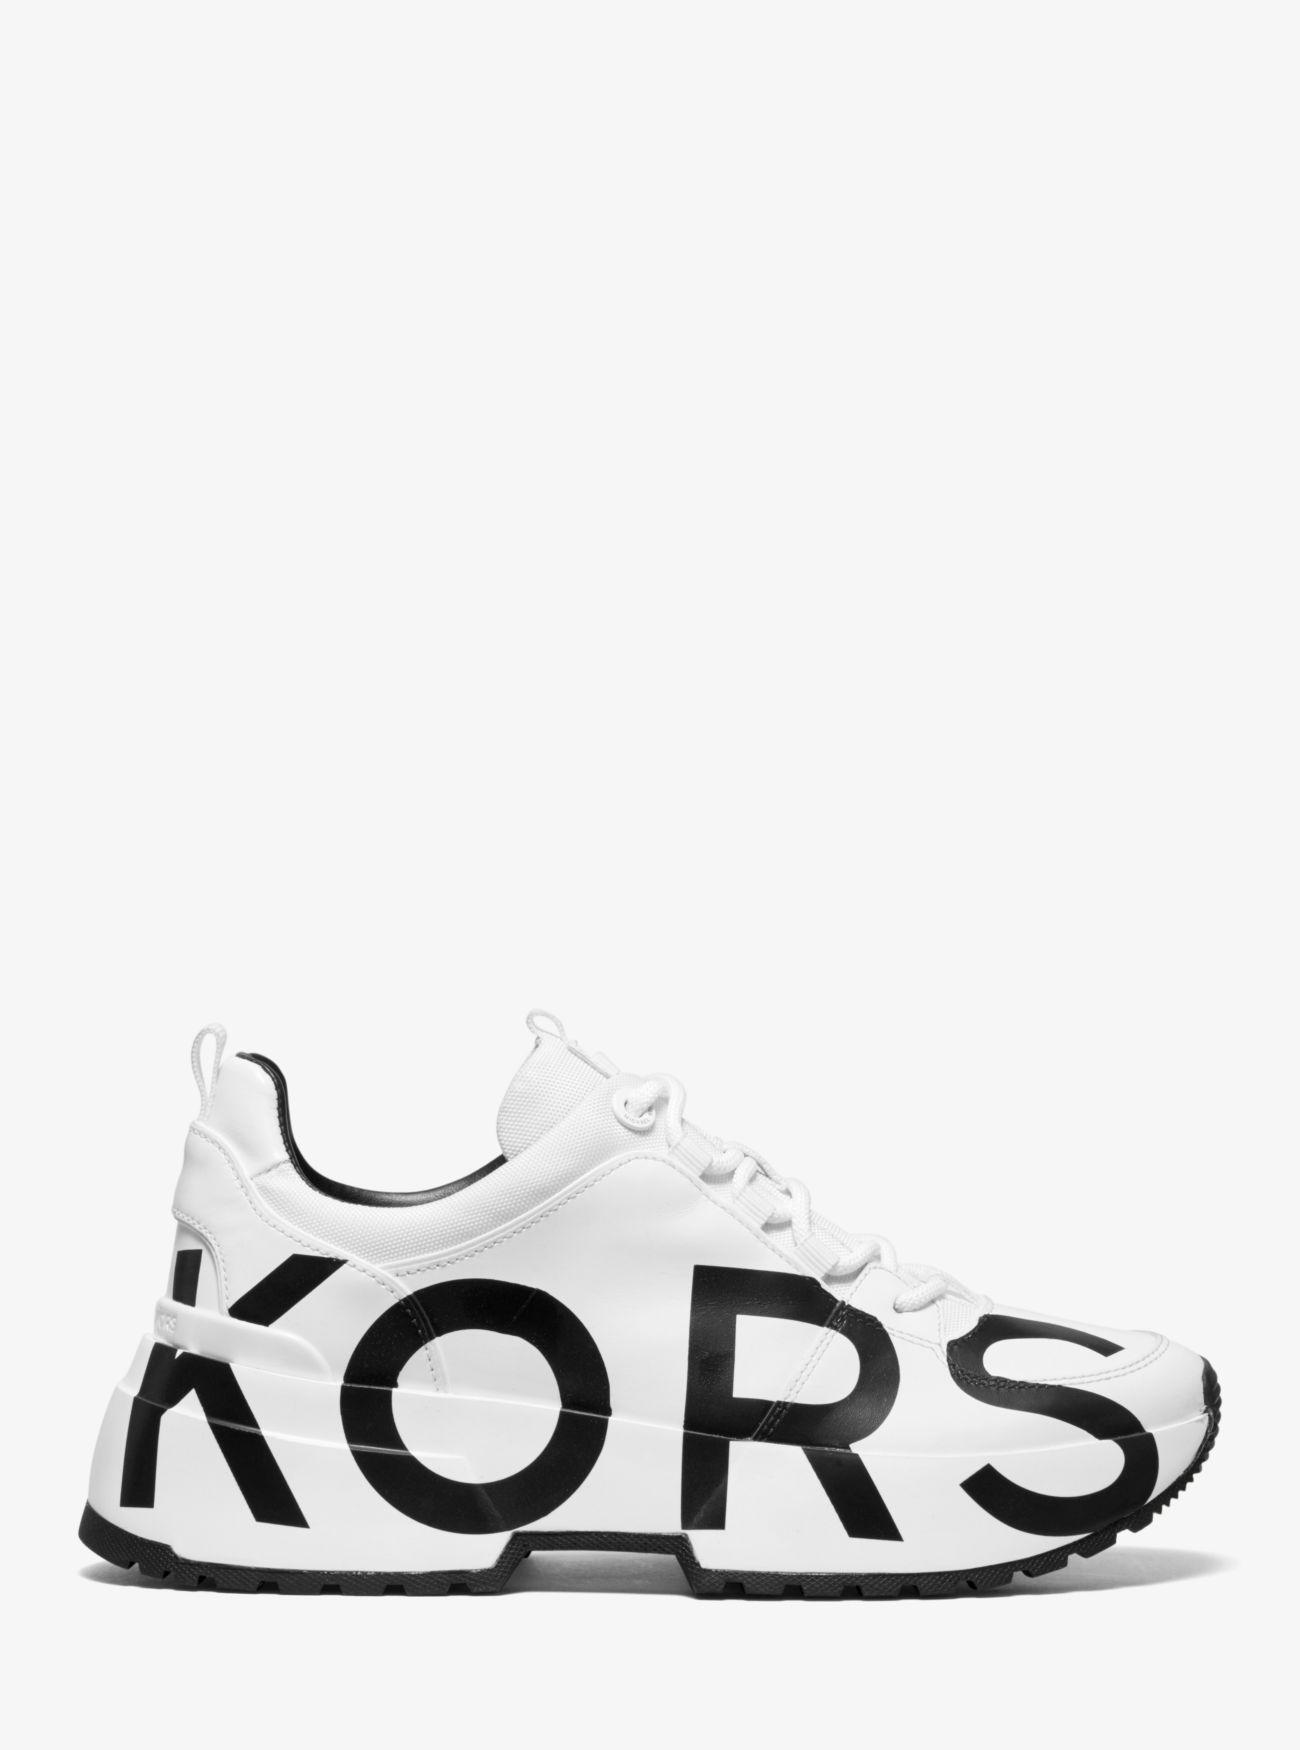 Michael Kors Cosmo Printed Leather